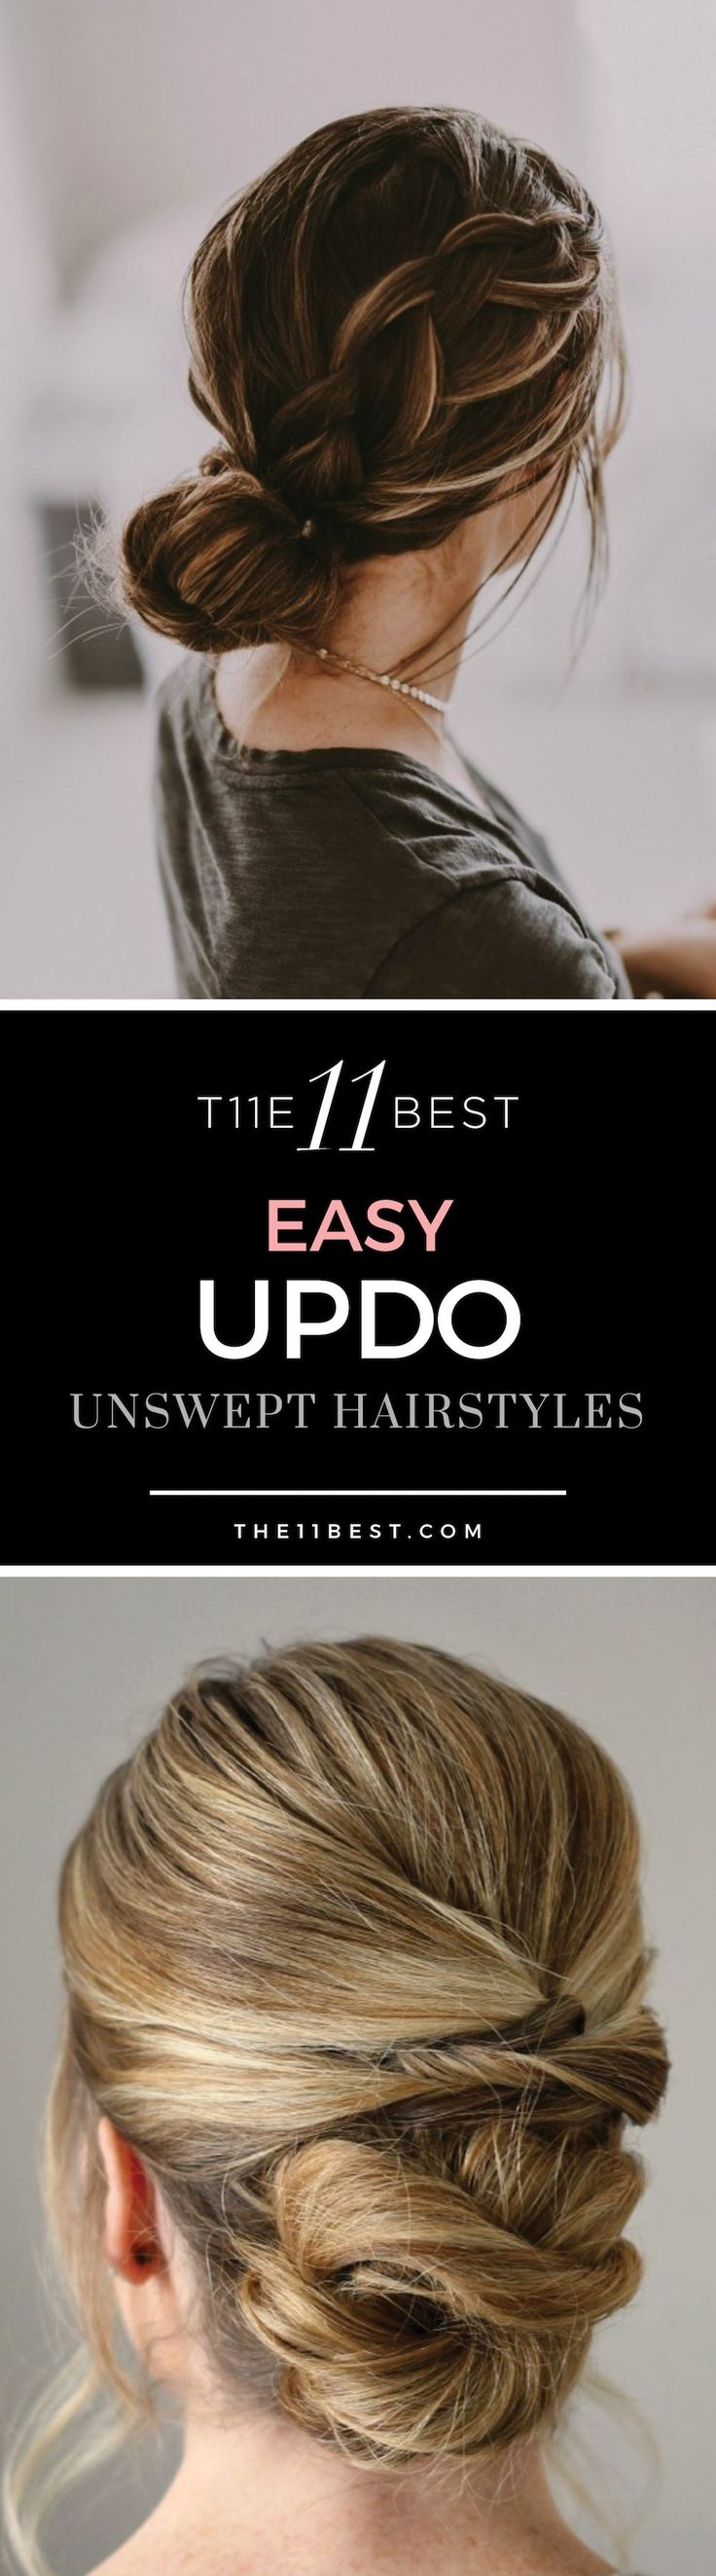 Best Loose Chignon Ideas On Pinterest Low Updo Loose Updo - Diy chignon boheme